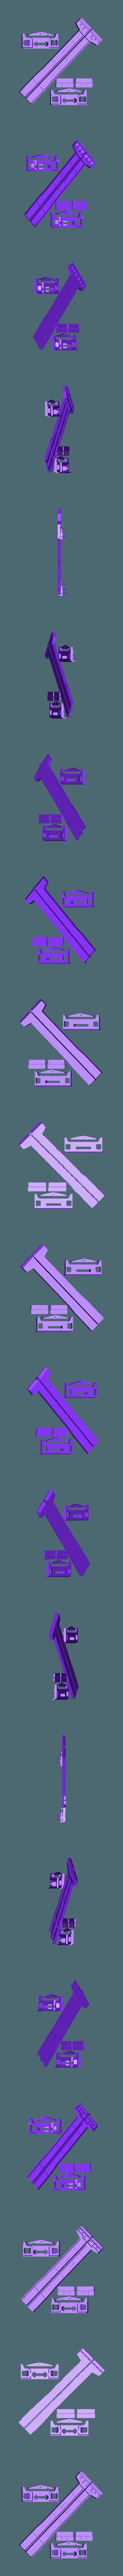 diesel01c_part01.stl Download STL file Diesel-01-C locomotive - ERS and others compatibile, FDM 3D printable • 3D printer object, euroreprap_eu